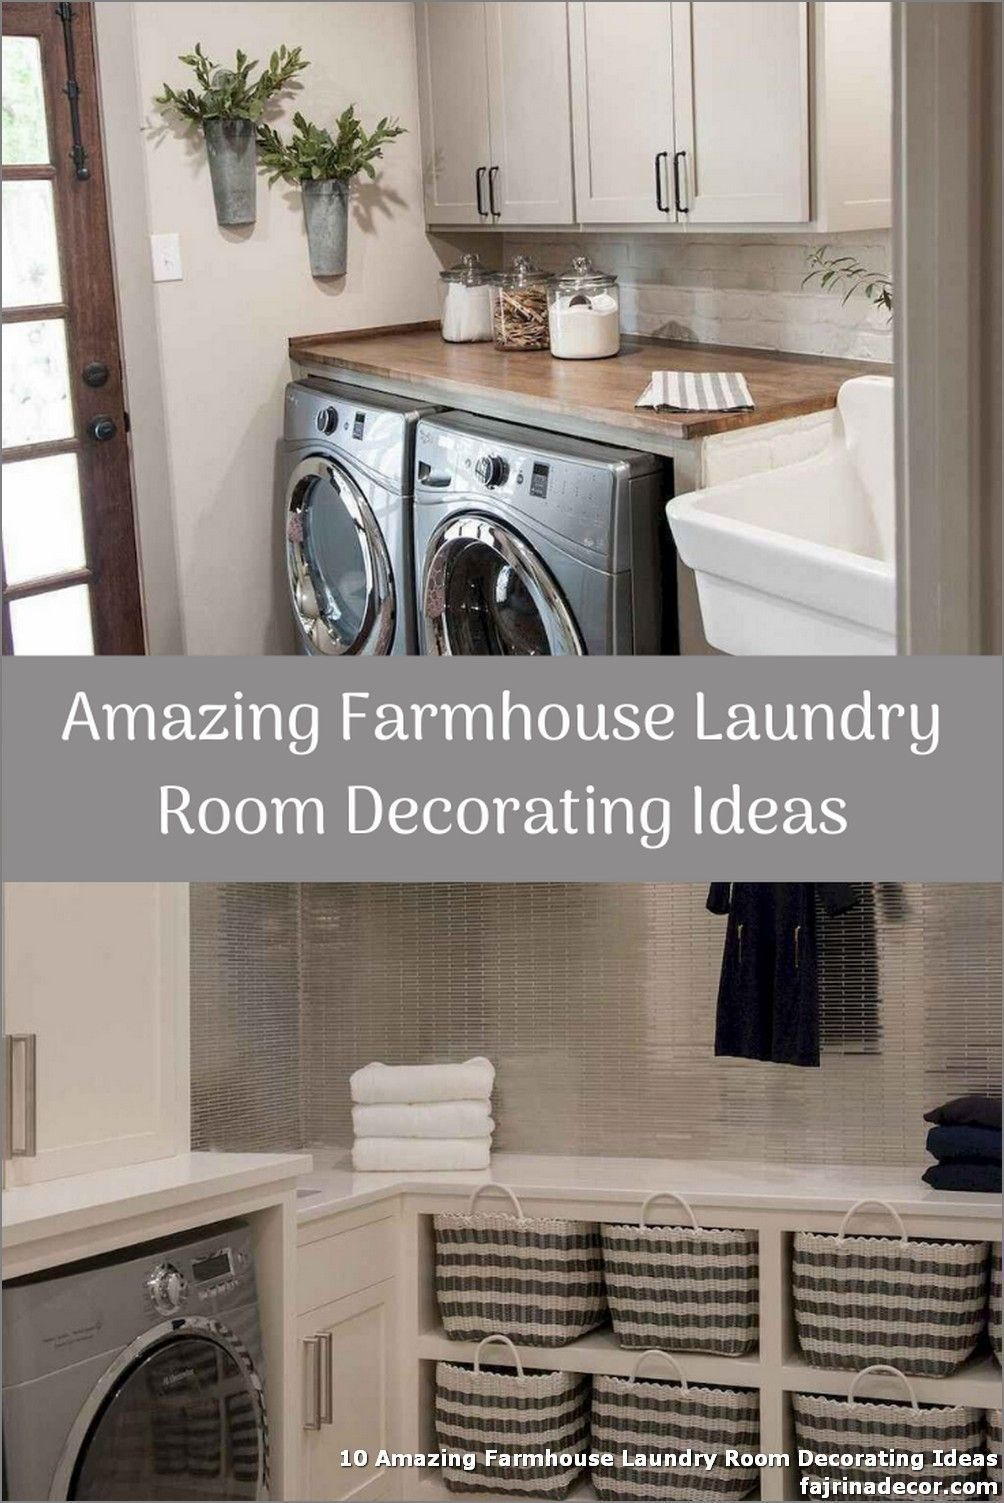 10 Amazing Farmhouse Laundry Room Decorating Ideas  10 Amazing Farmhouse Laundry Room Decorating Ideas  It moreover effortlessly adjustments rig